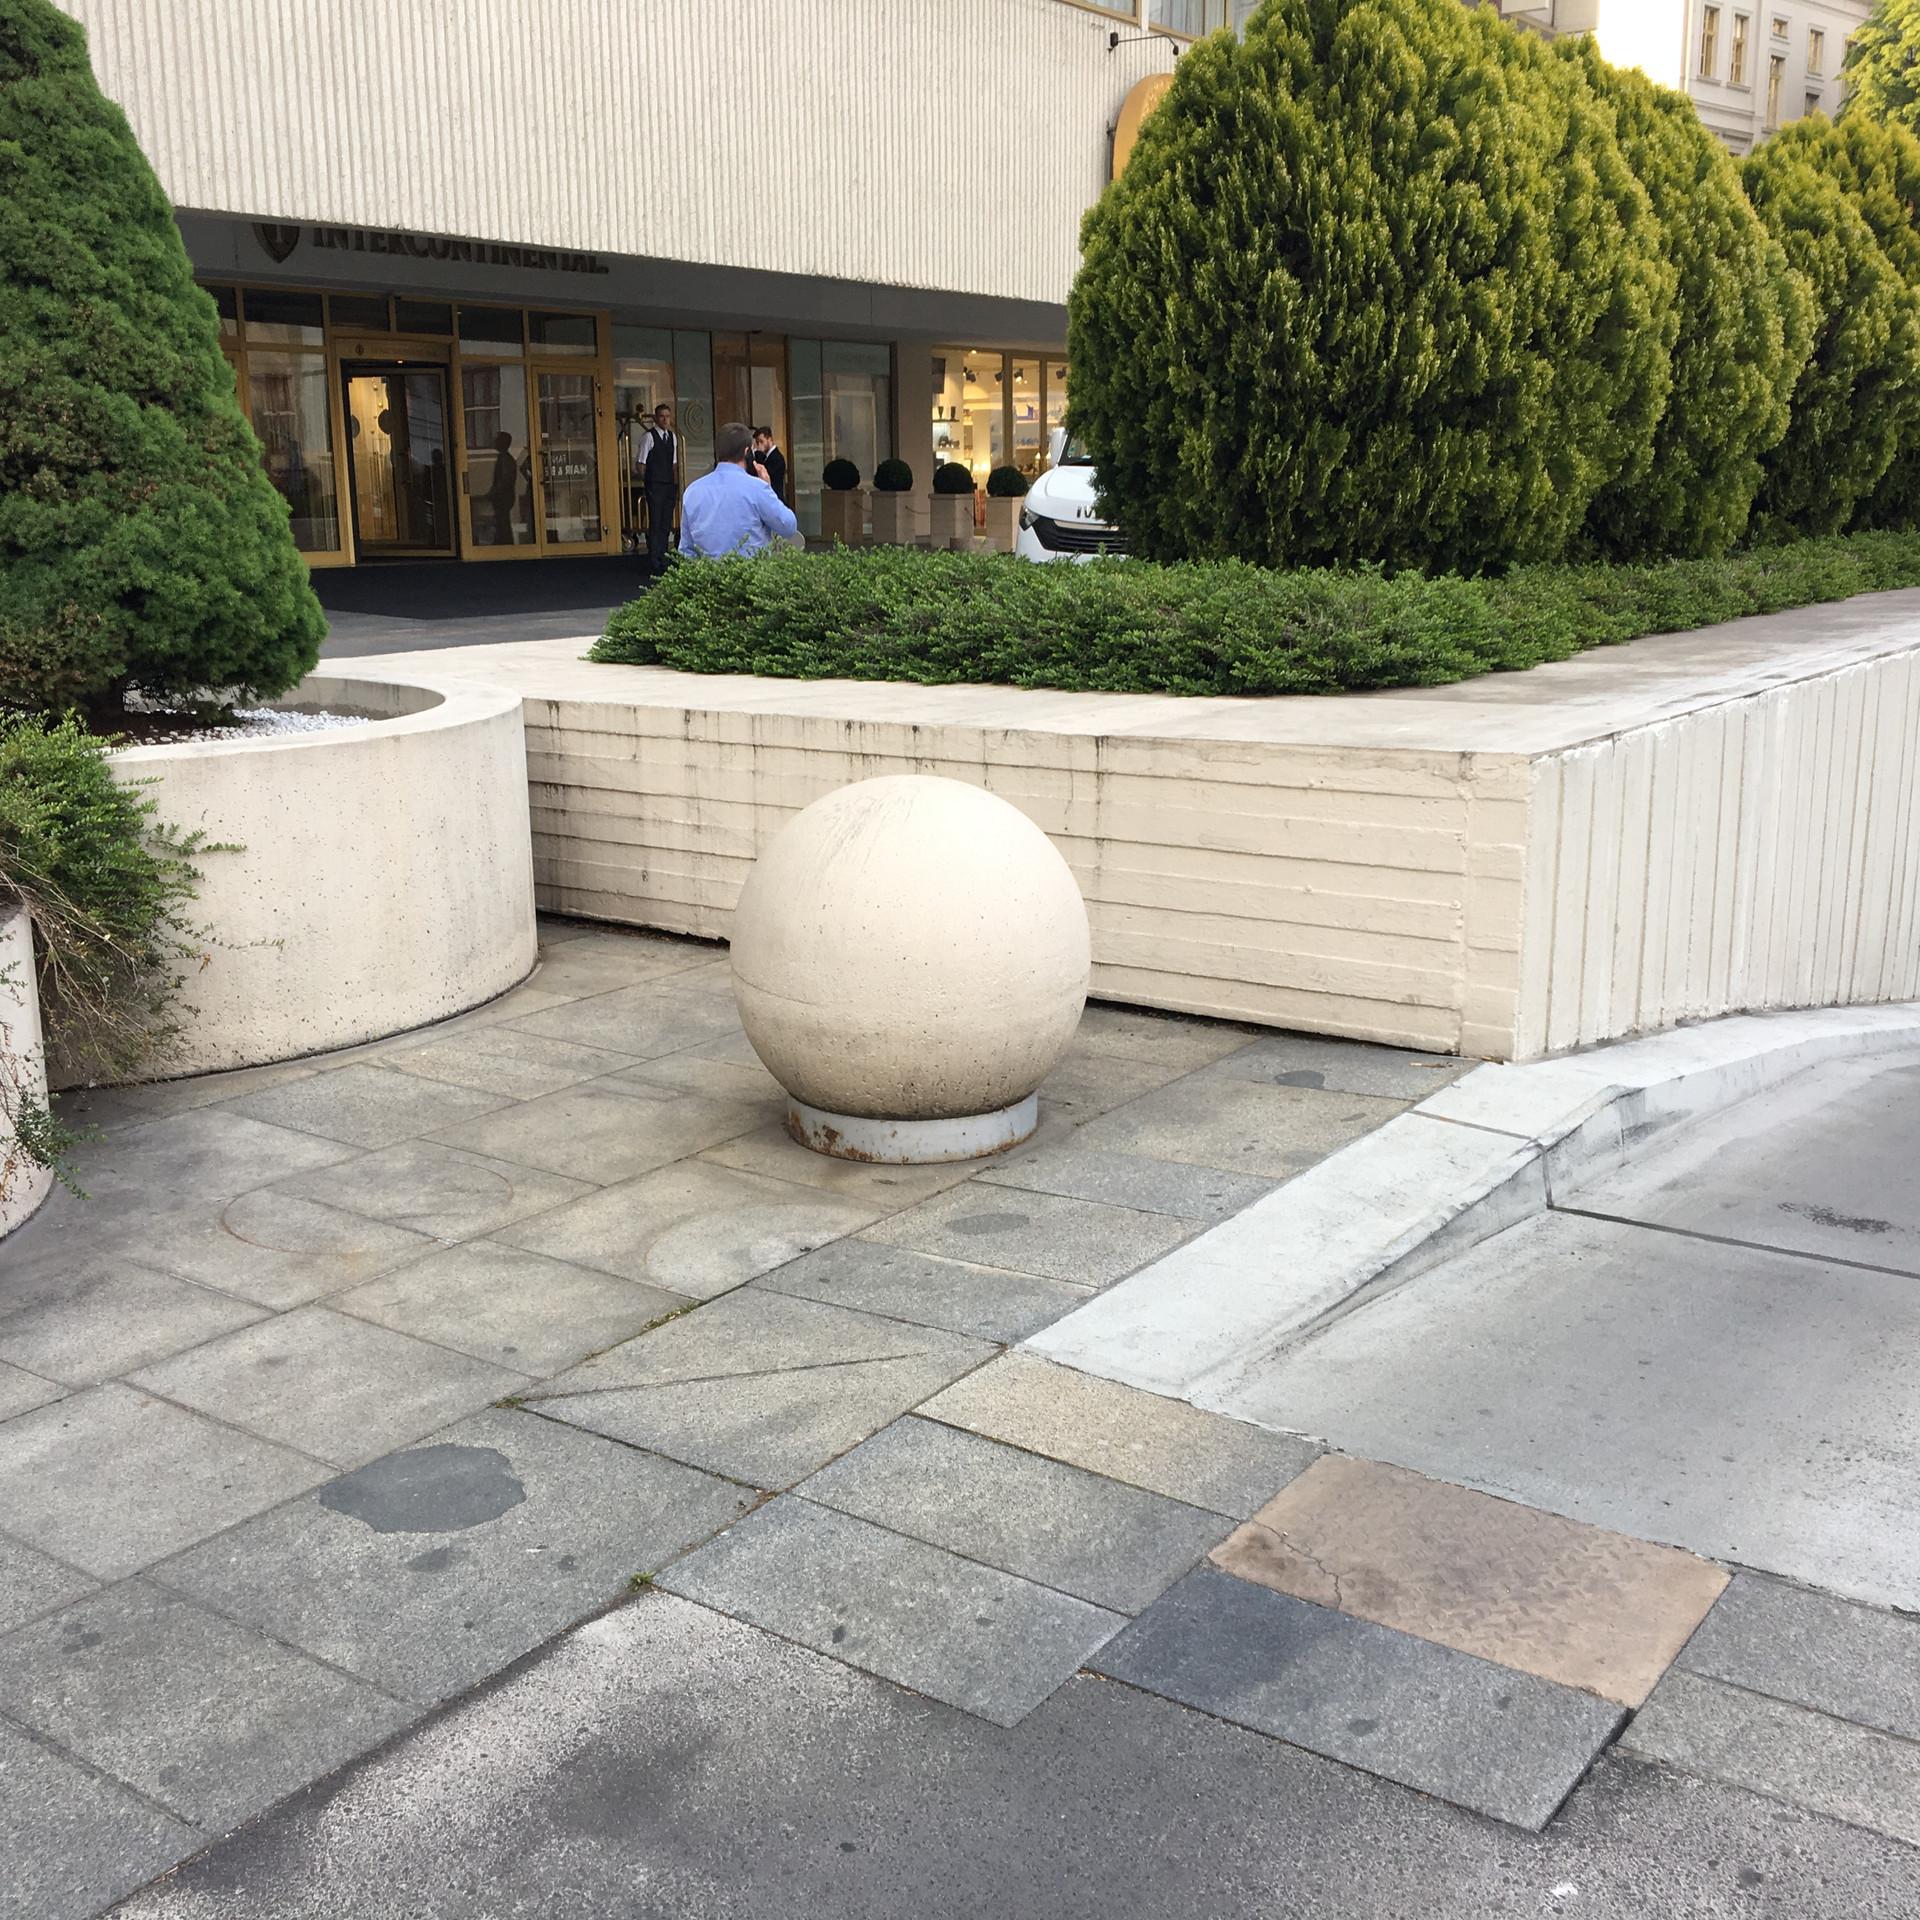 Gap over big ball